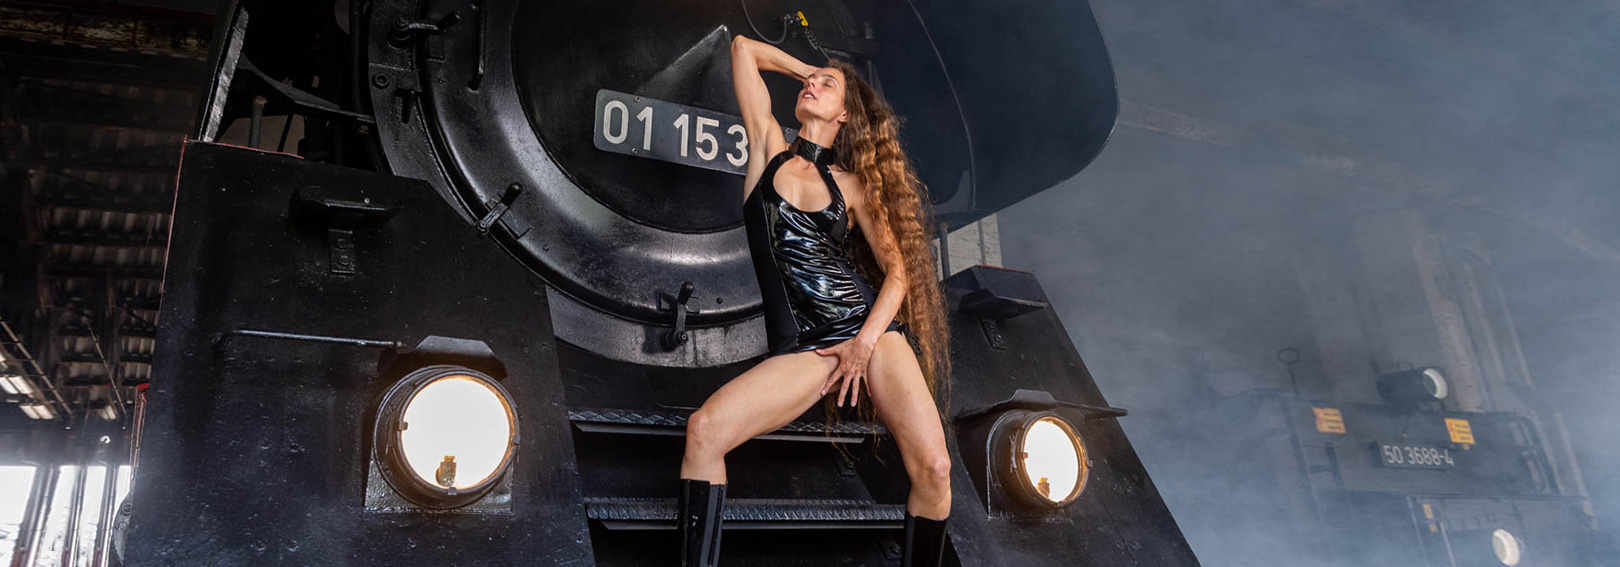 Tanago Fotoshooting Arnstadt Erlebnisreisen Eisenbahnreisen Dampflok